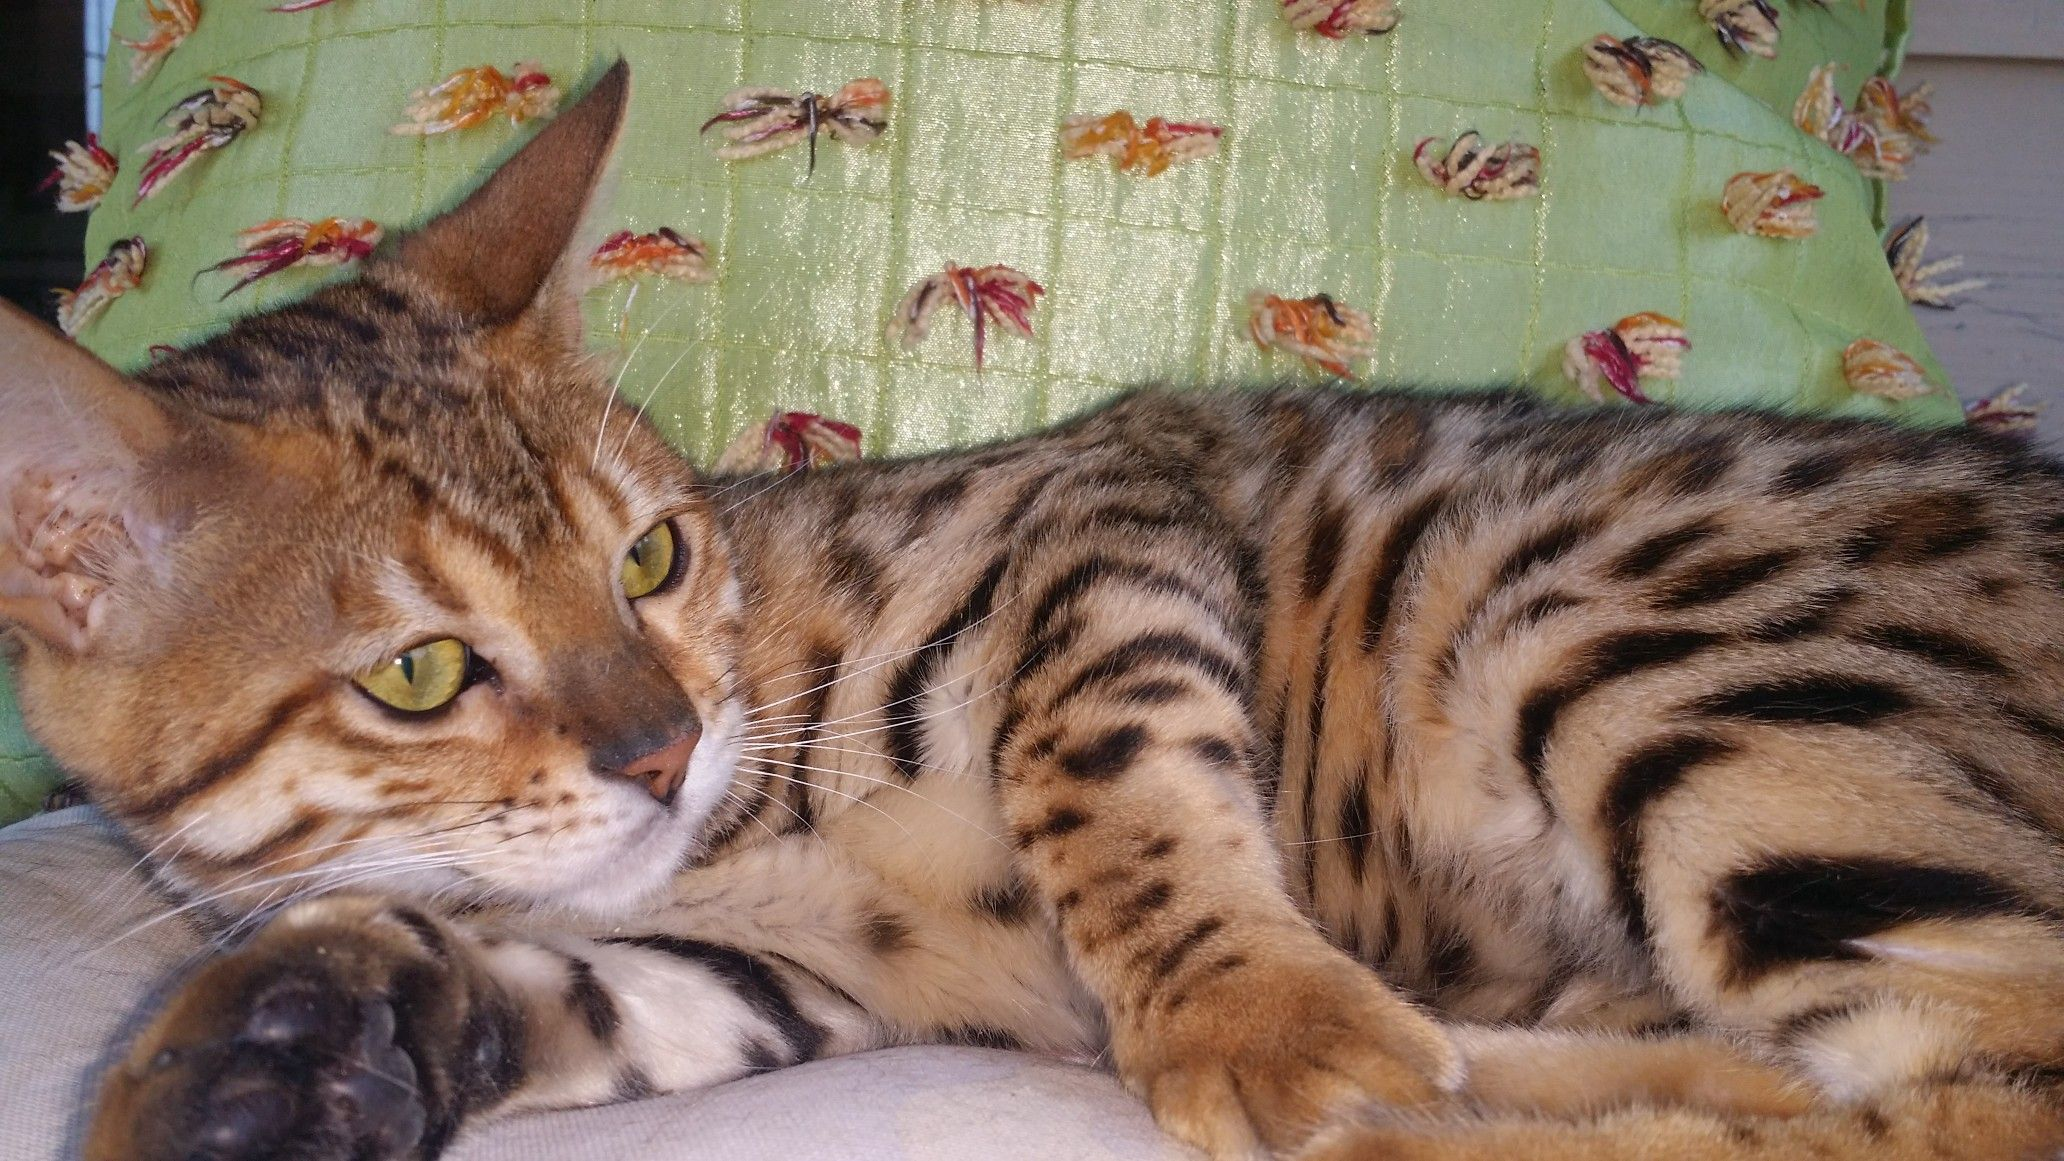 Brown tabby bengal kitten age 6 months...belongs to